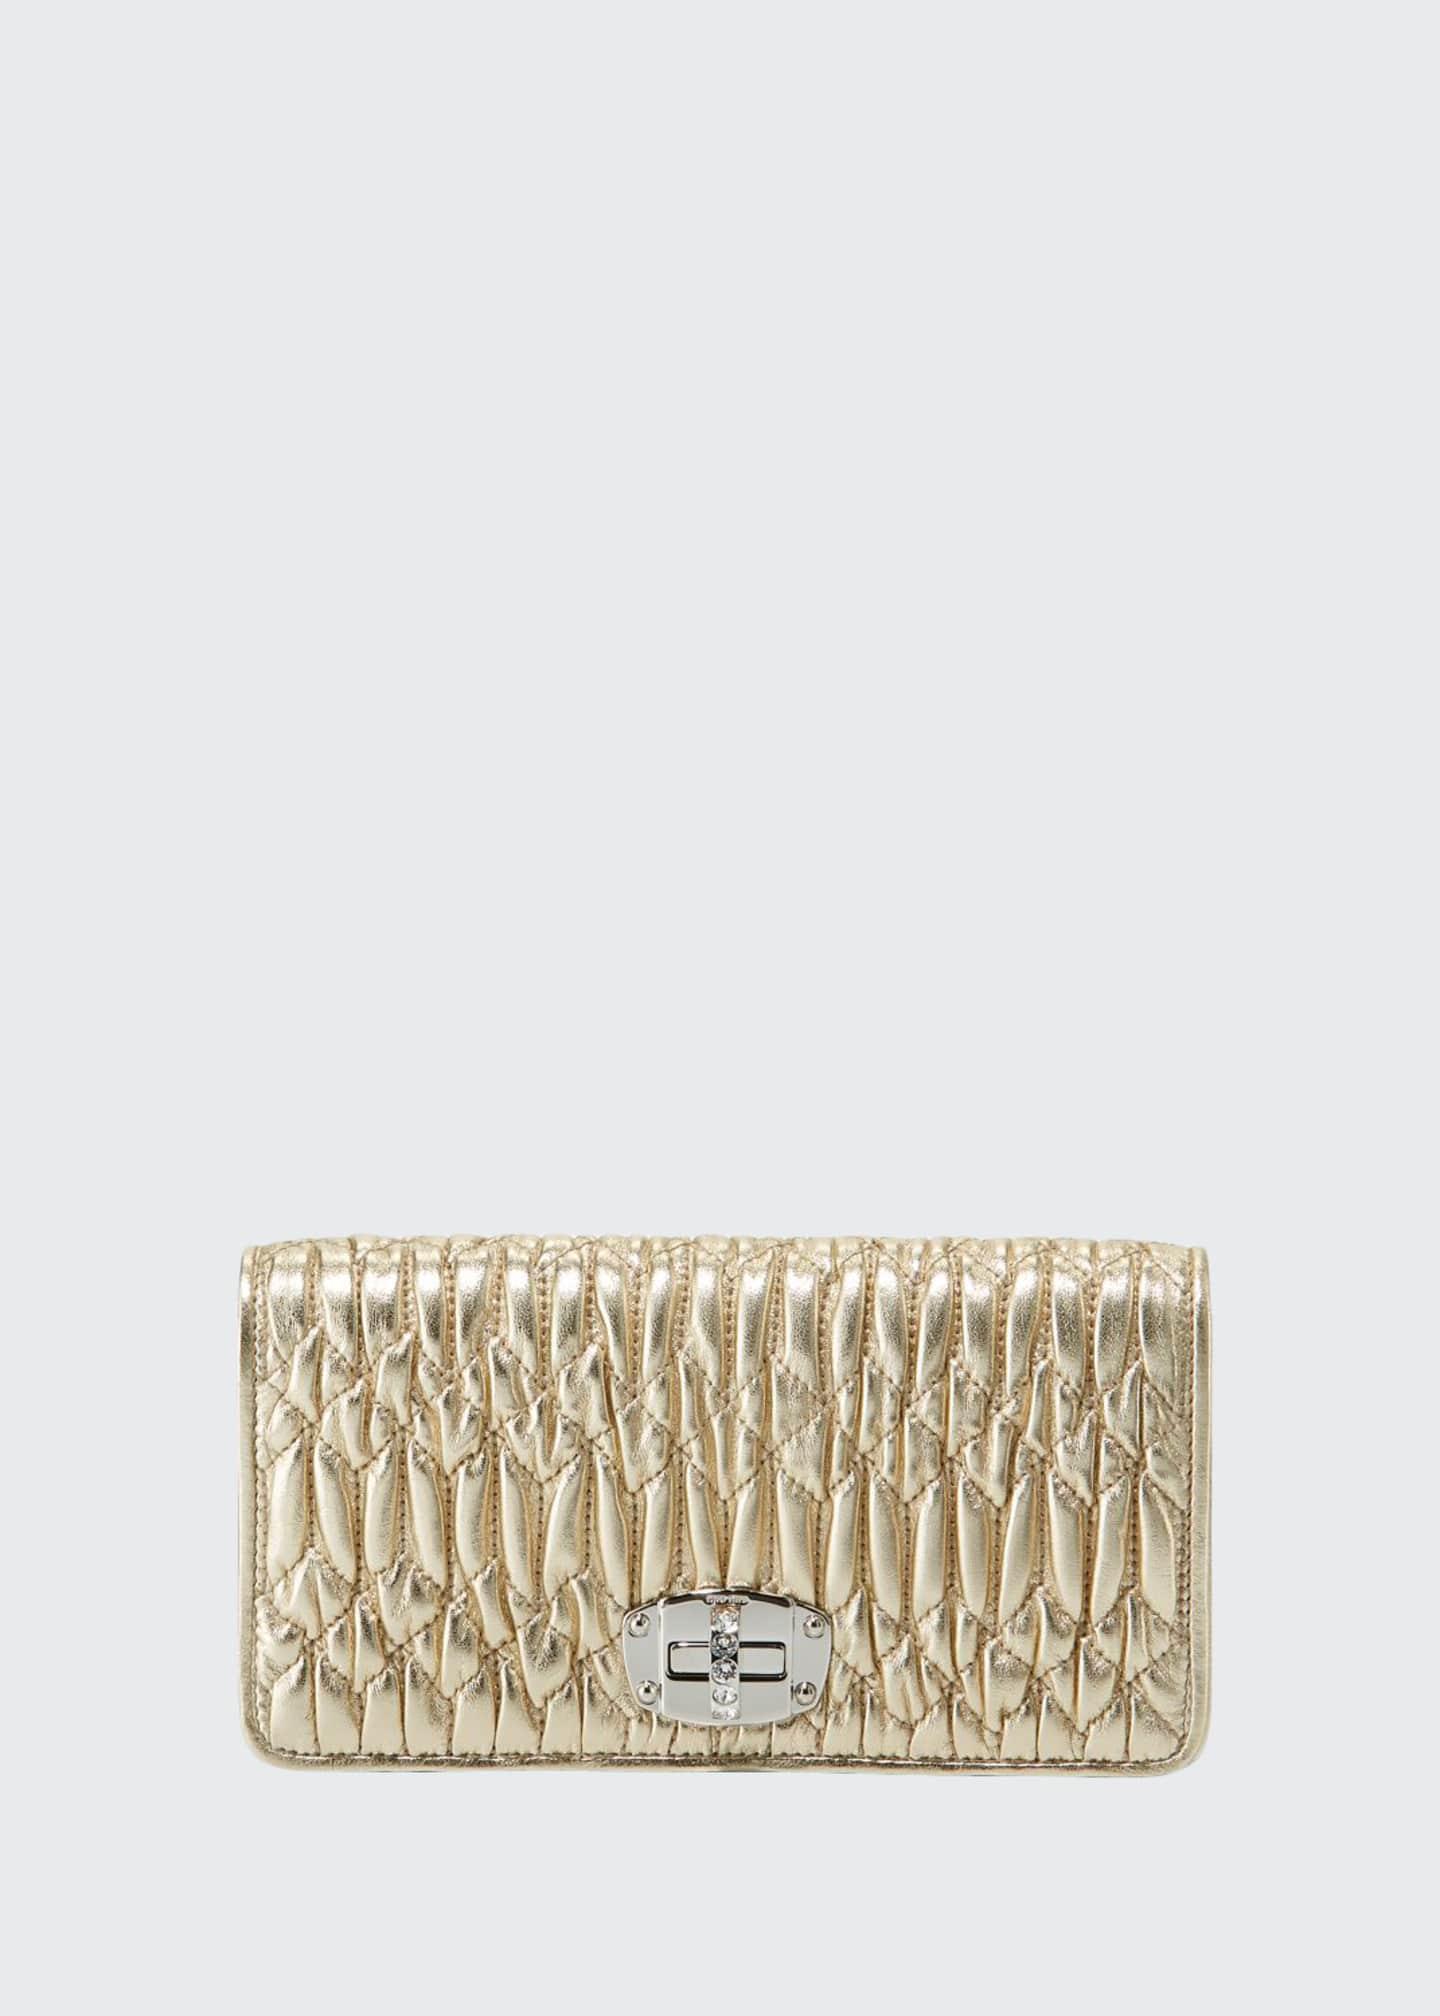 Miu Miu Napa Leather Wallet on a Crossbody